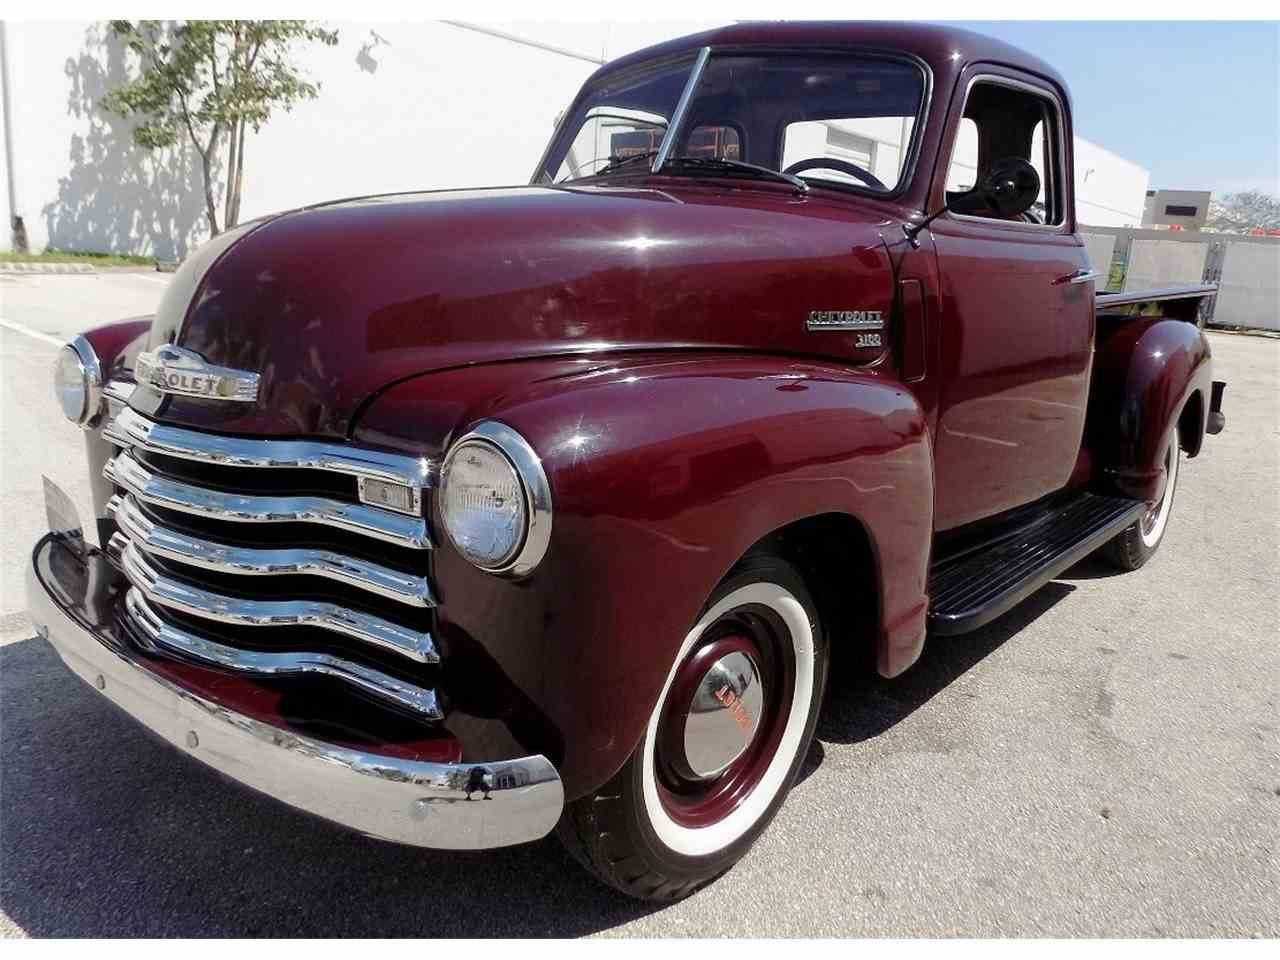 Pickup 1949 chevrolet pickup : 1949 Chevrolet Pickup for Sale   ClassicCars.com   CC-1021751